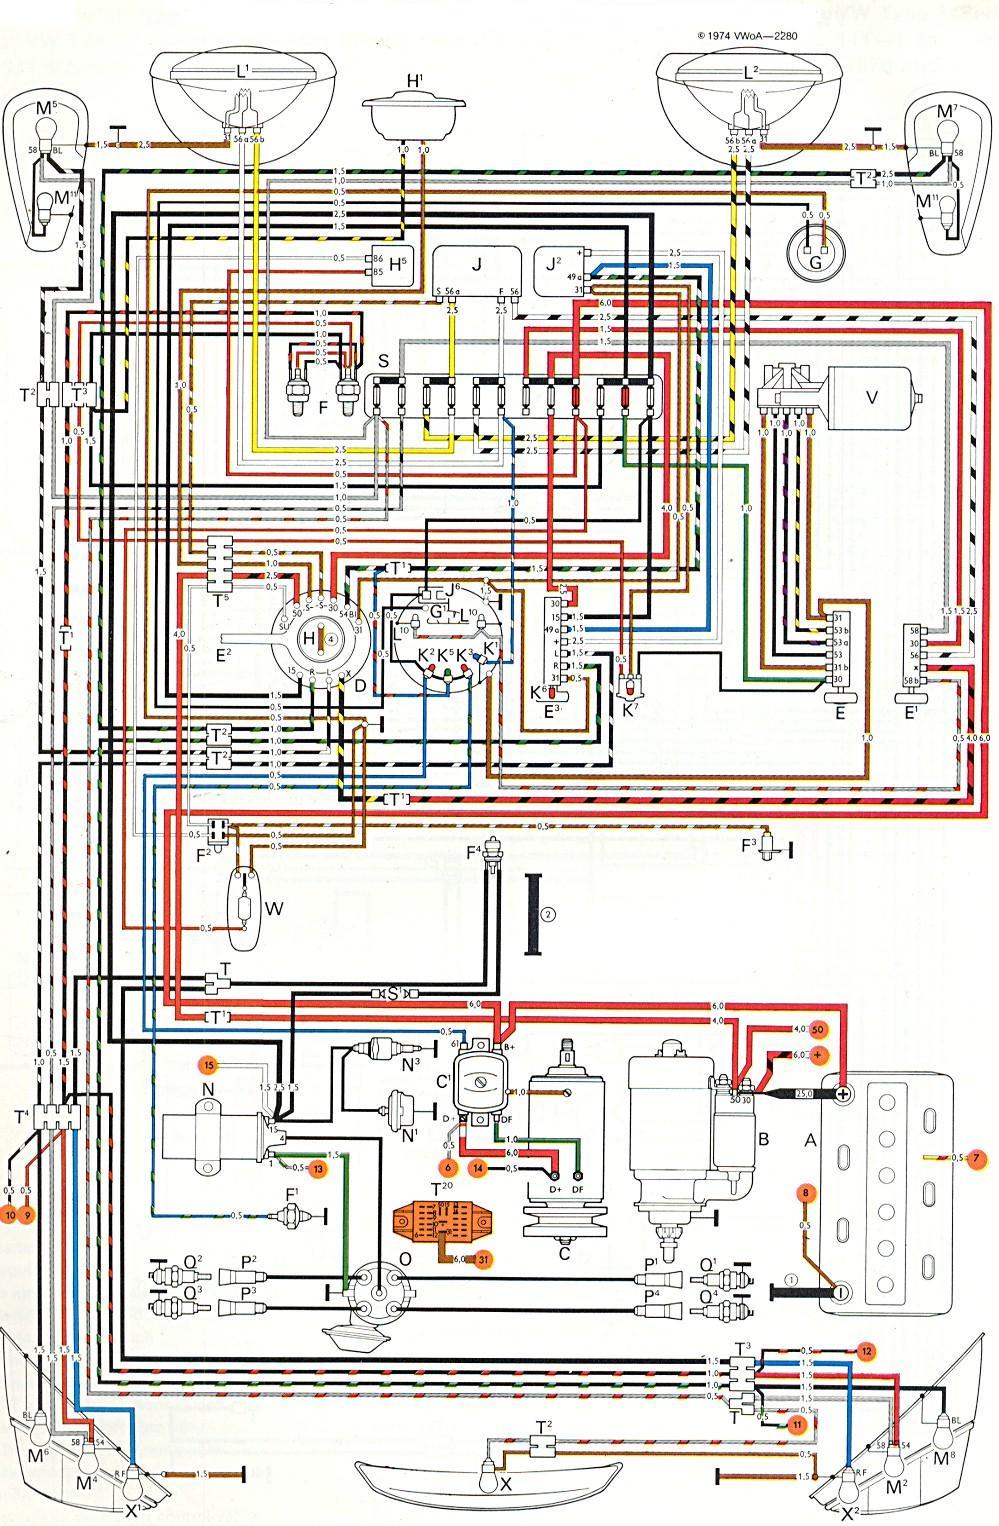 1972 vw beetle wire schematic 1972 vw bug wiring wiring diagrams show  1972 vw bug wiring wiring diagrams show